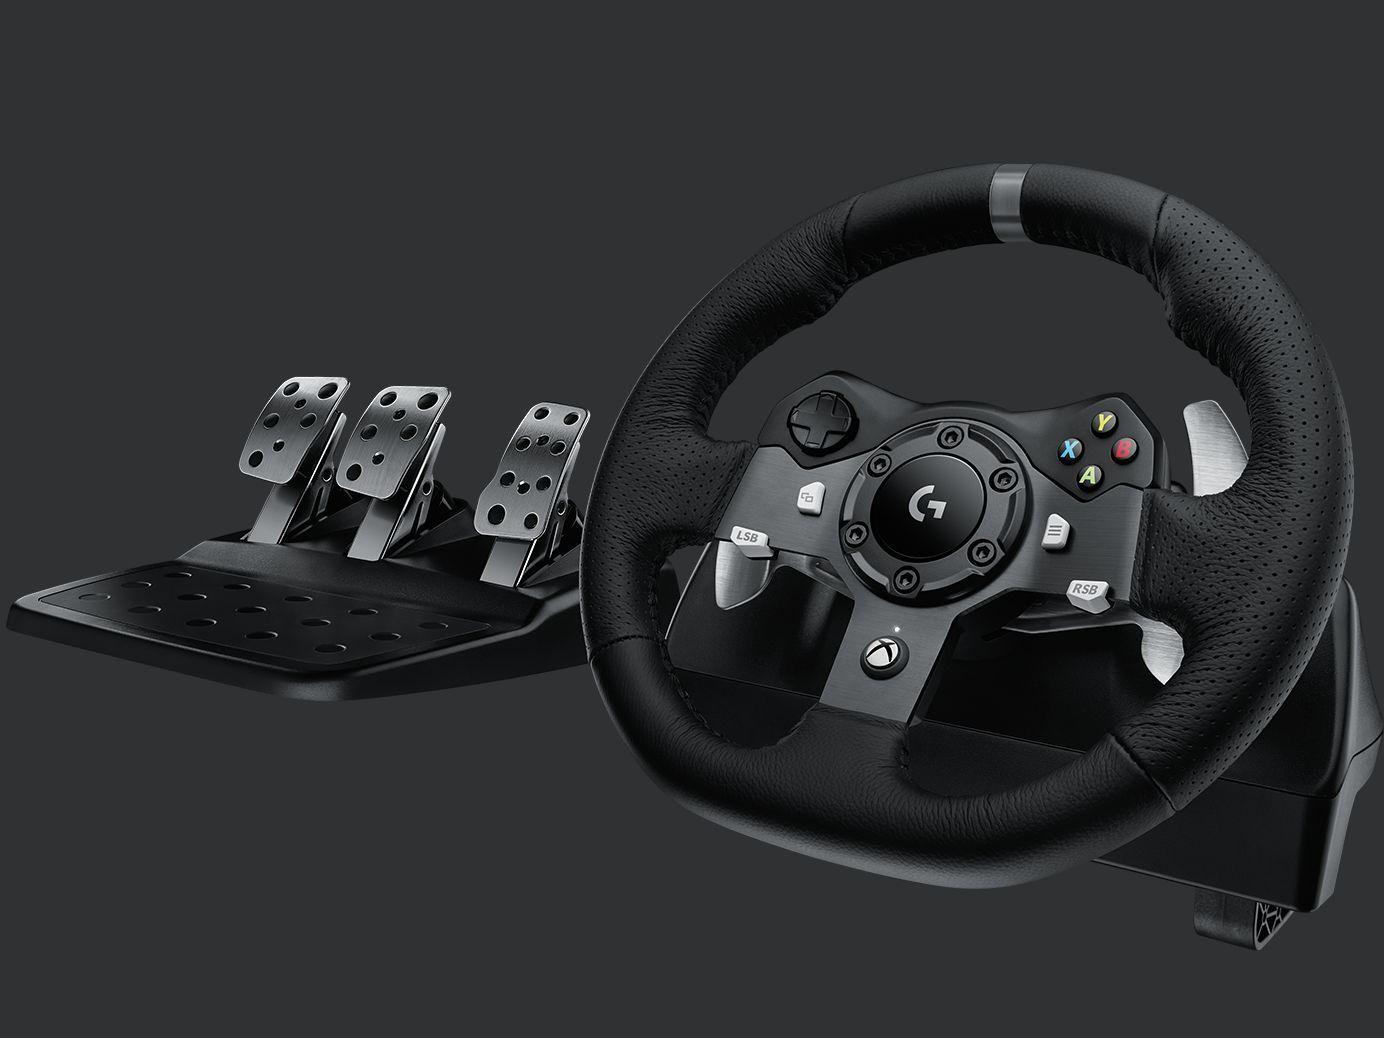 Logitech G920 G29 Driving Force Steering Wheels Pedals Steering Wheel Driving Wheel